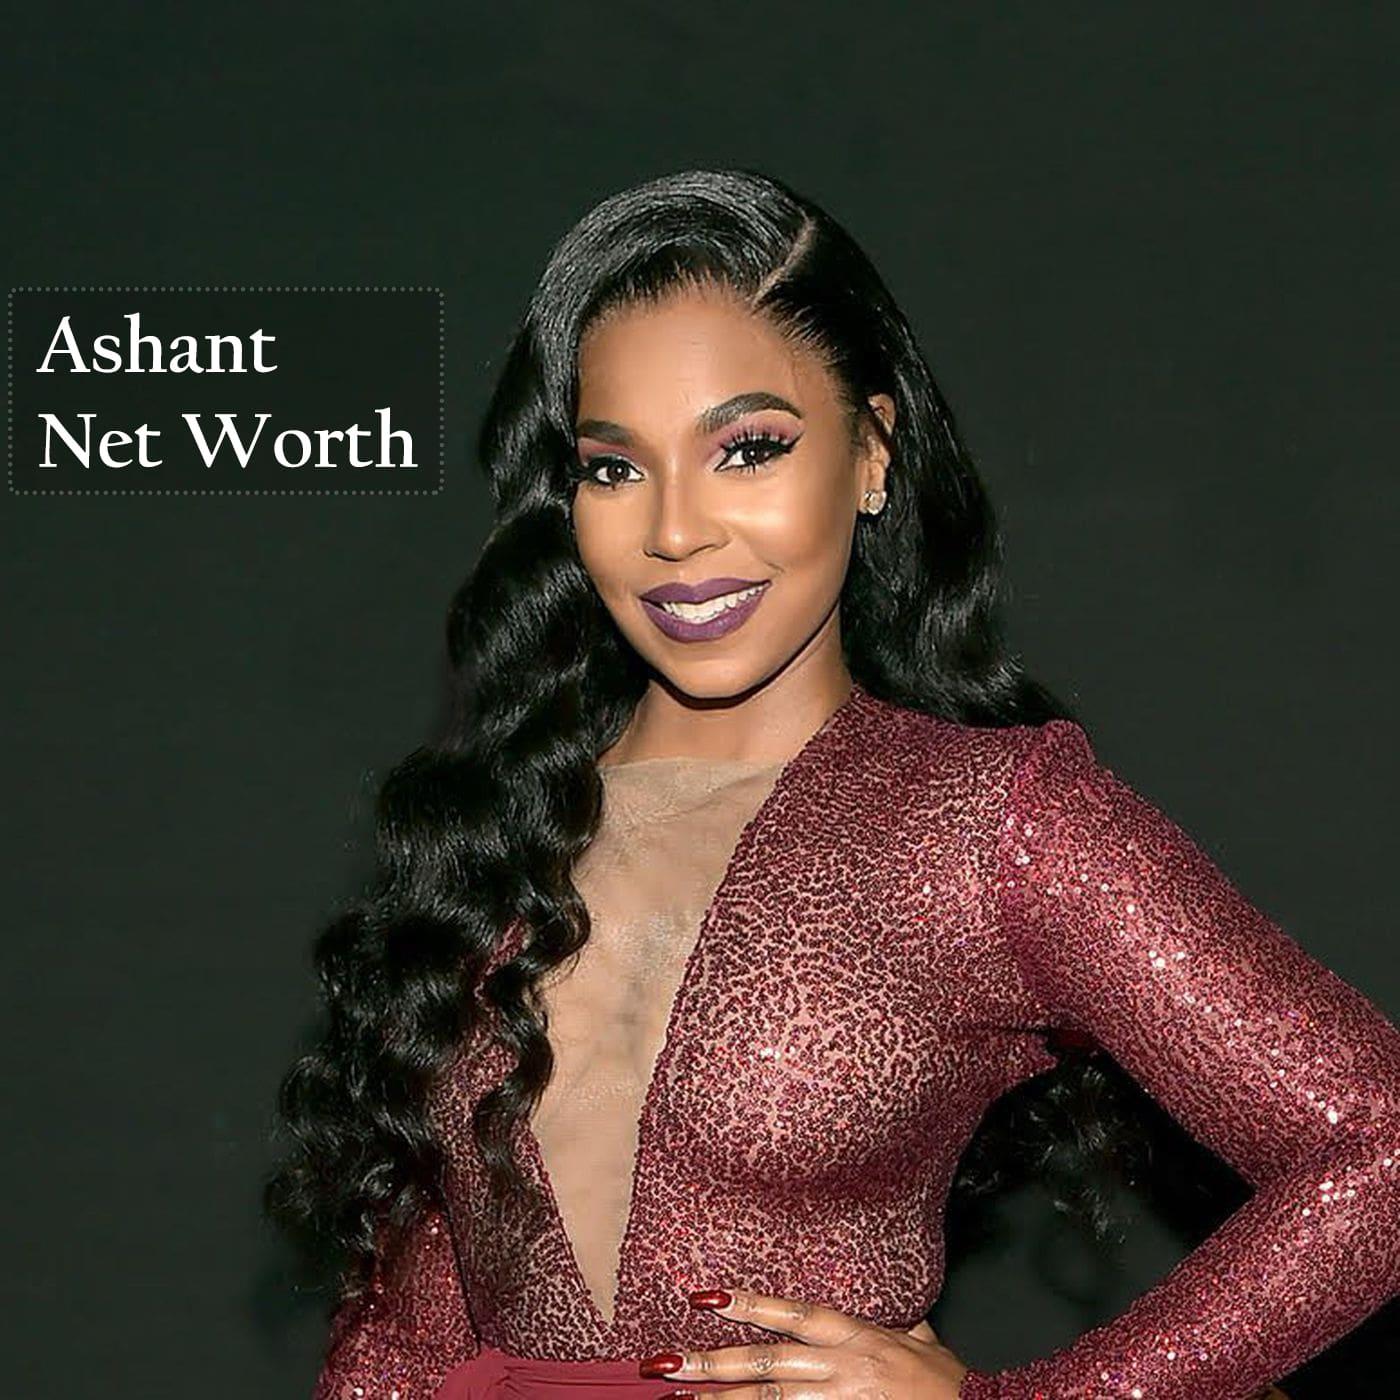 Ashant Net Worth